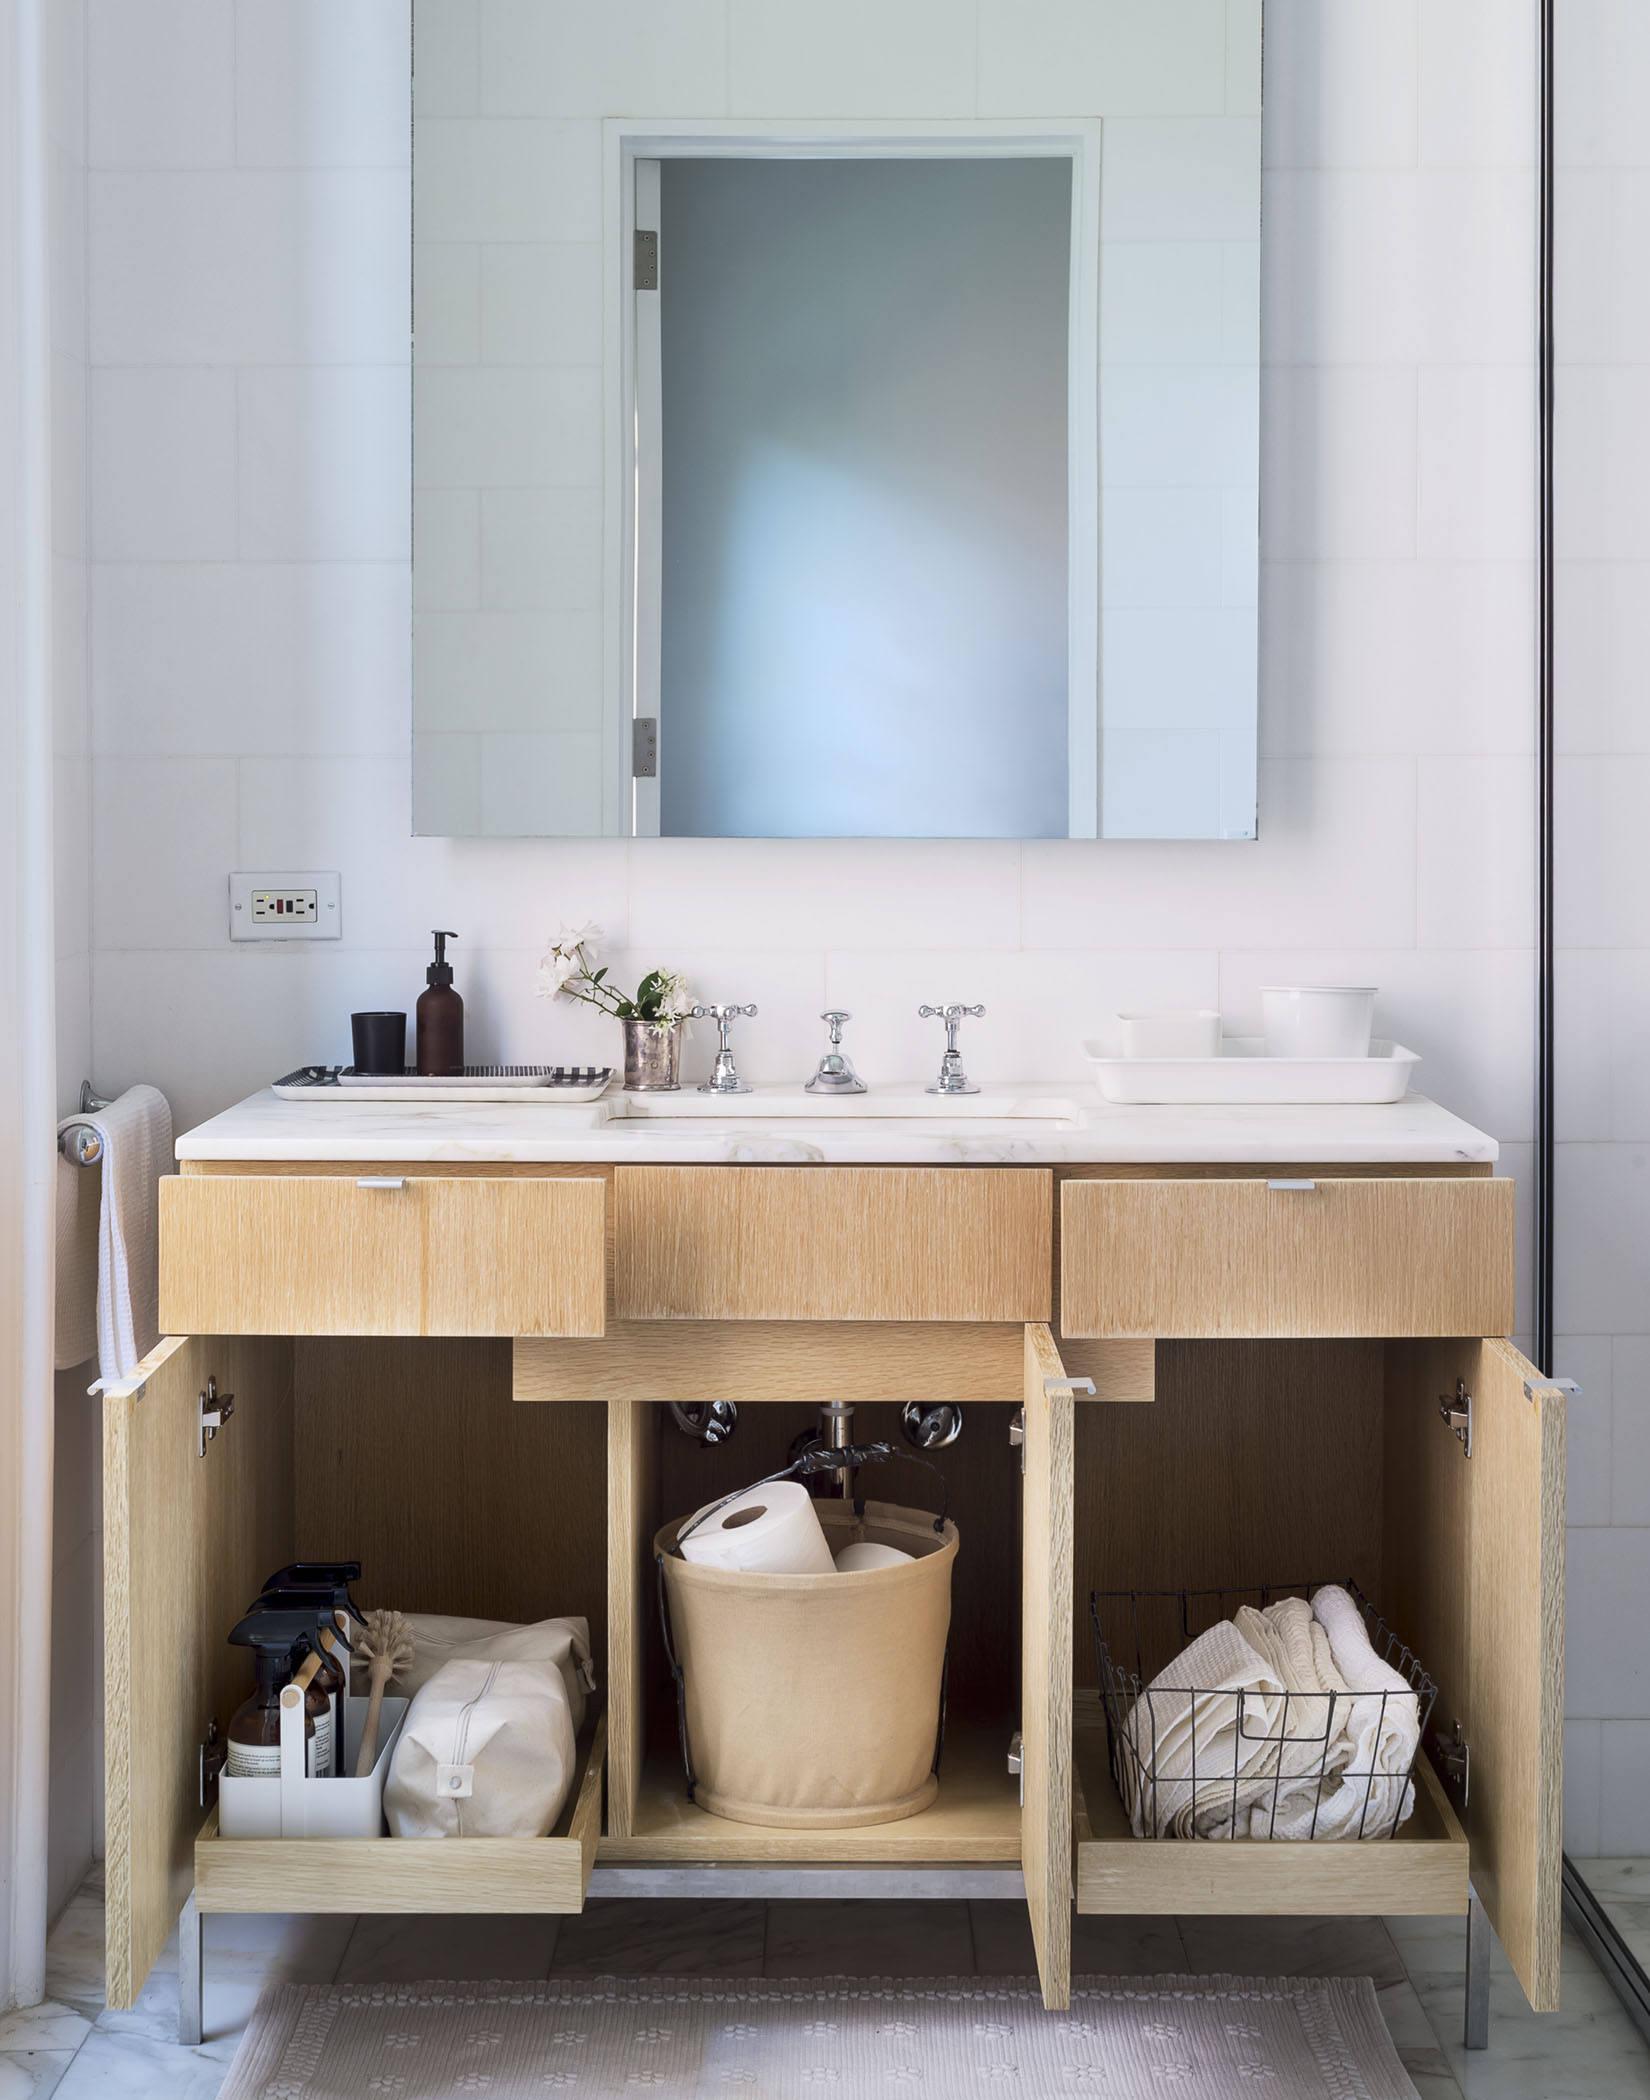 opbergruimte badkamer badkamermeubel inrichten